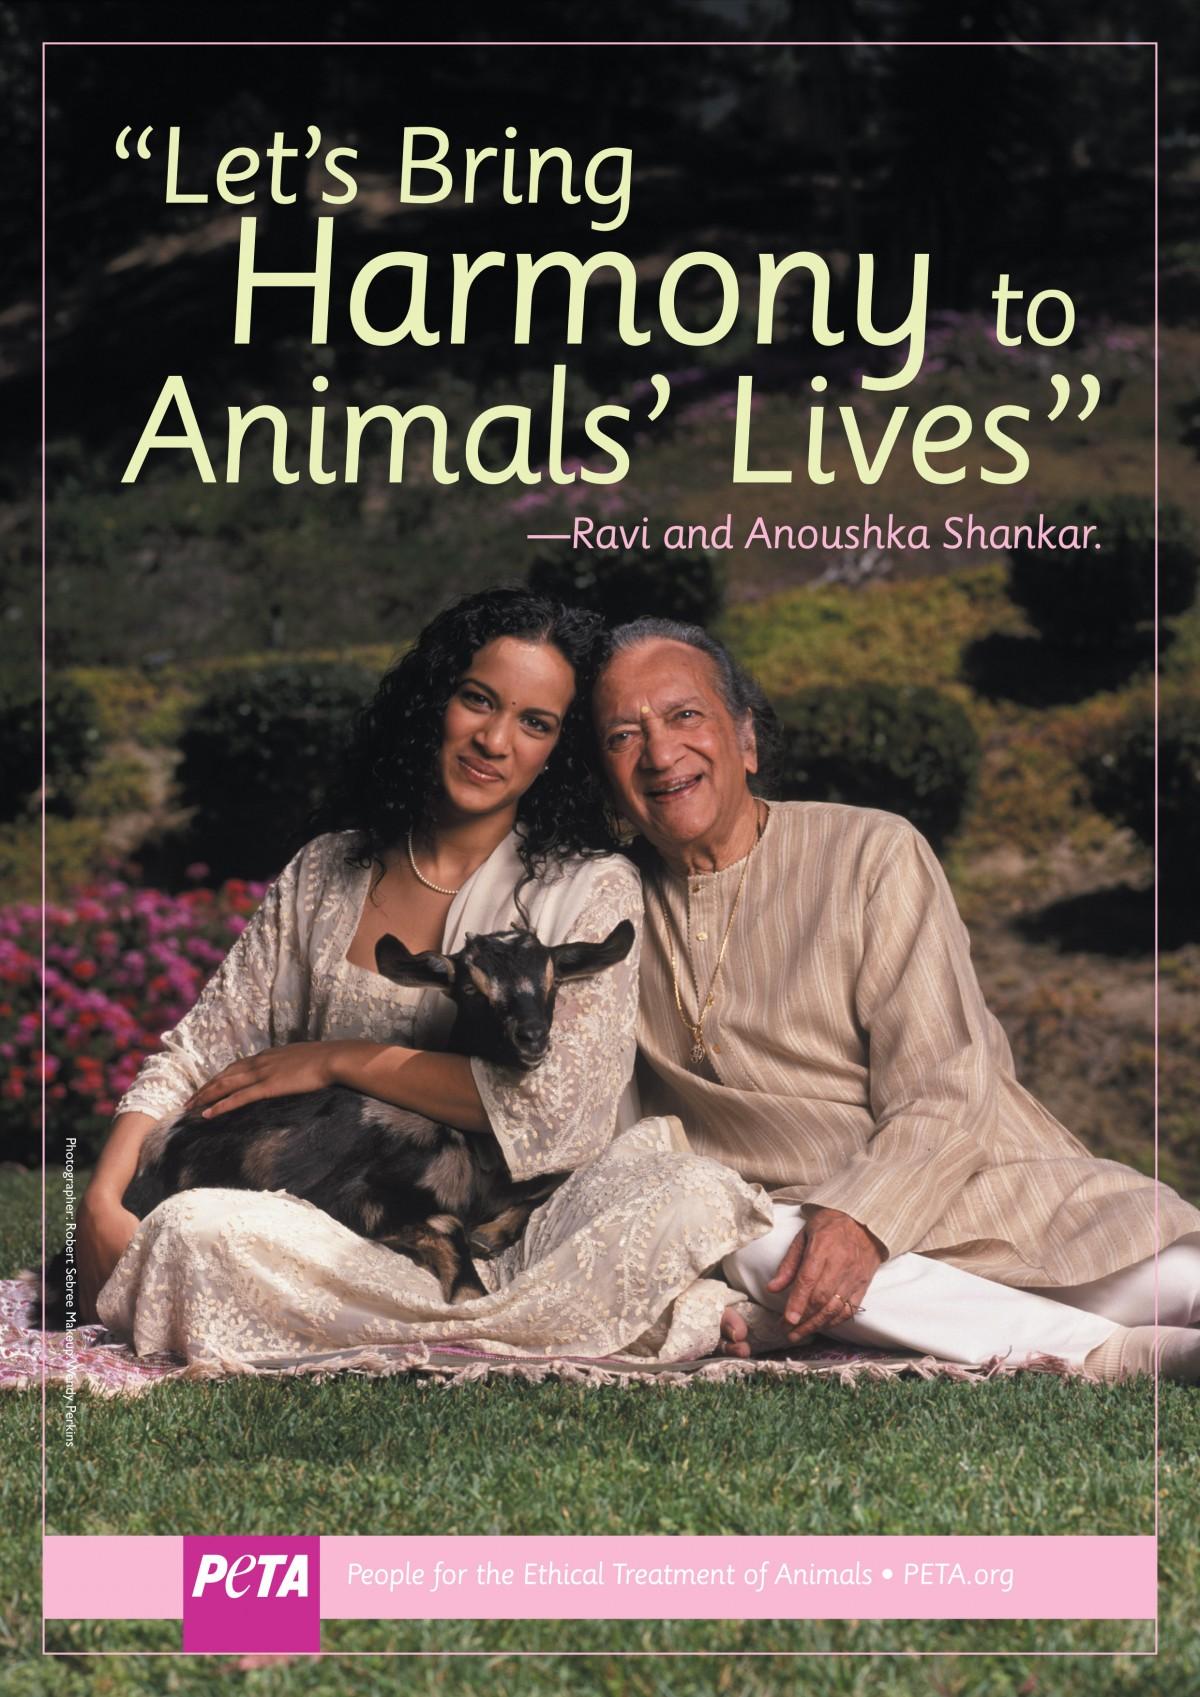 Ravi and Anouska Shankar PETA ad